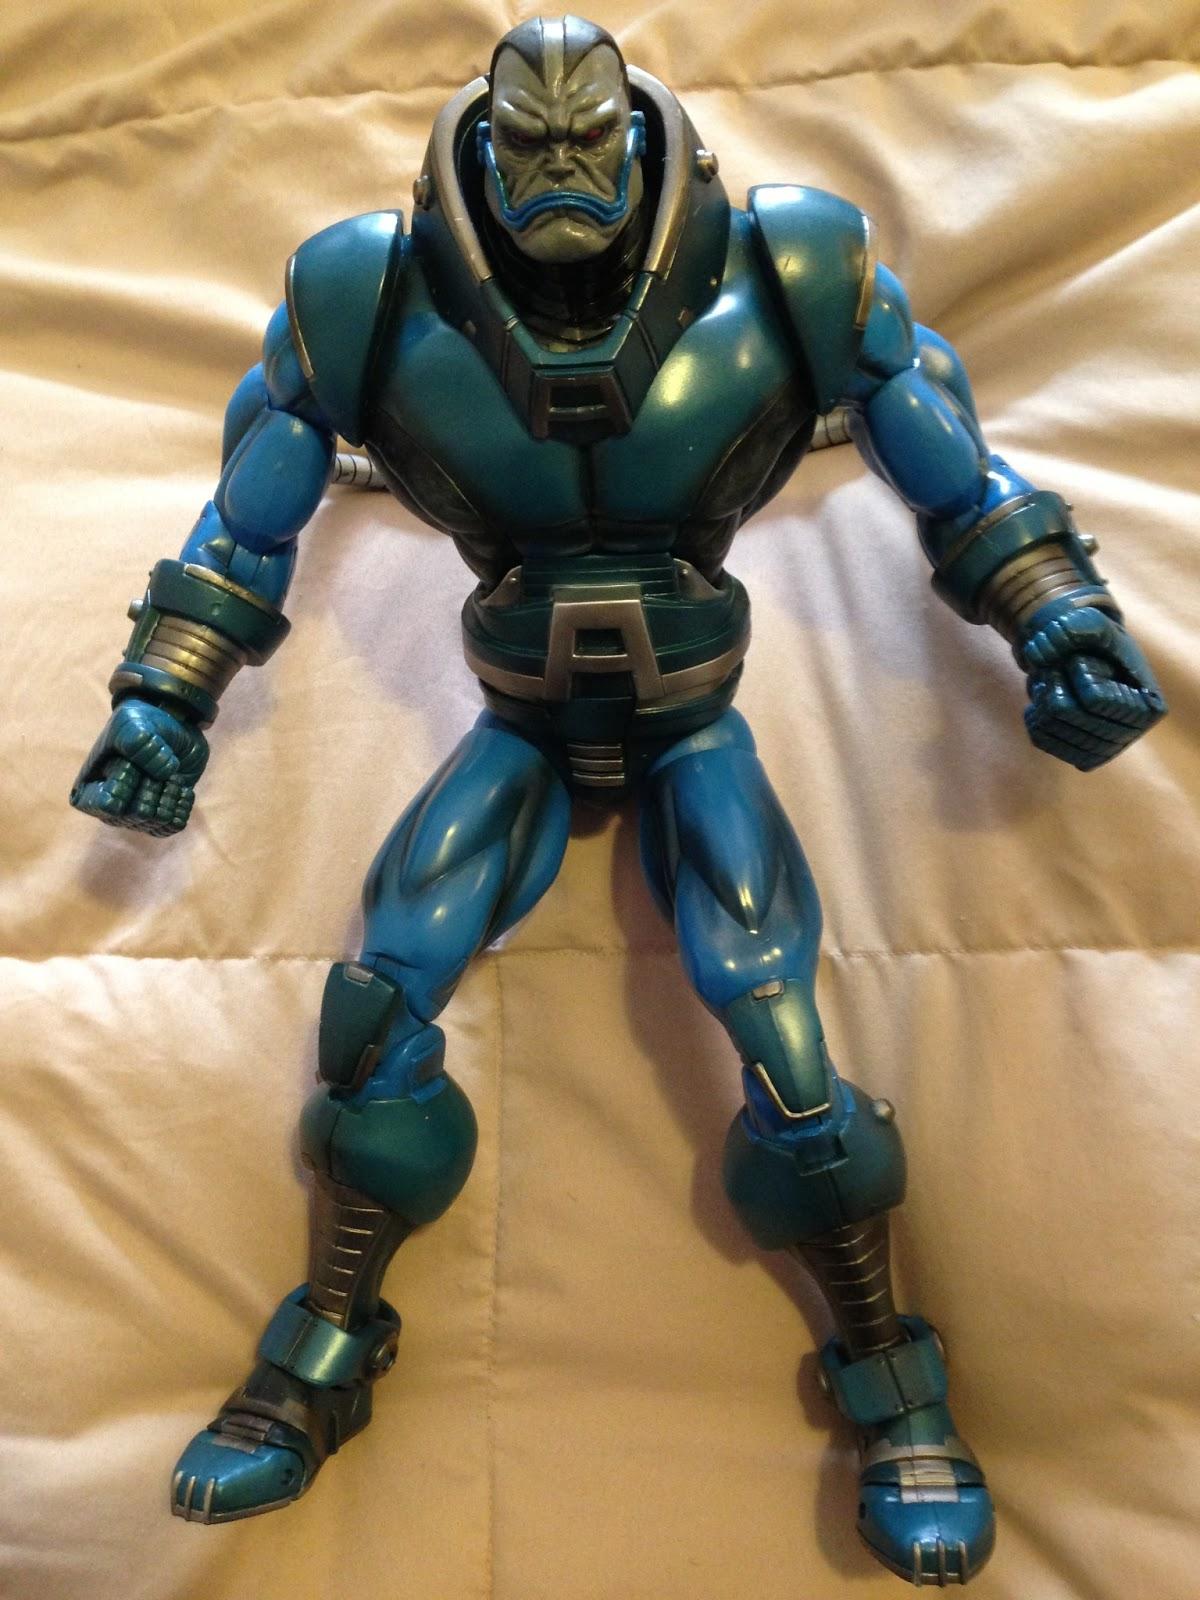 Marvel Legends Build-A-Figure BAF Part Piece GIANT MAN Left Foot Toybiz 2005